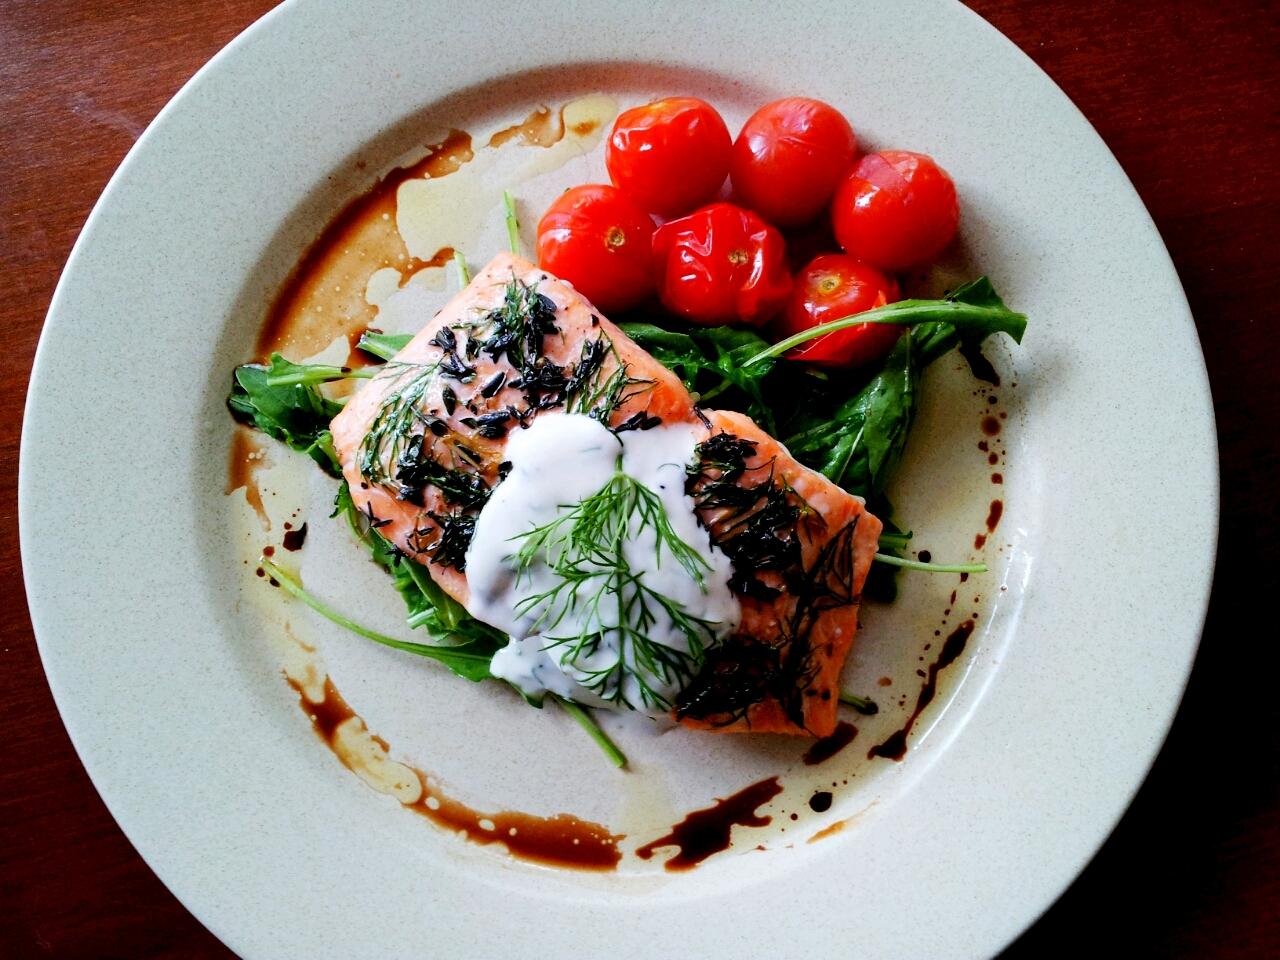 and Herbs Baked Norway Salmon, Dill Yoghurt Sauce, Wild Rocket, Roast ...